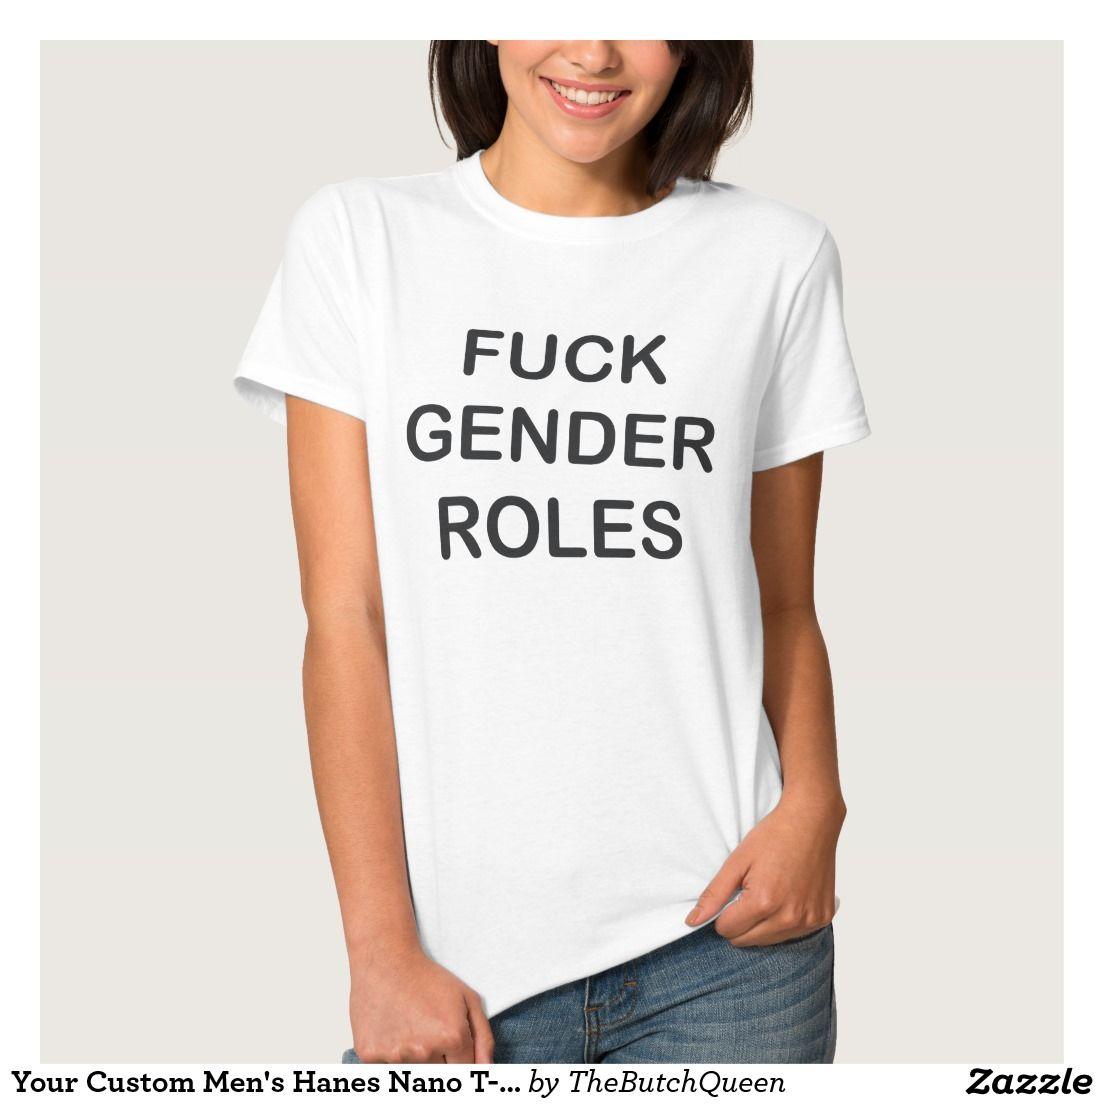 Design your own t-shirt hanes - Your Custom Men S Hanes Nano T Shirt